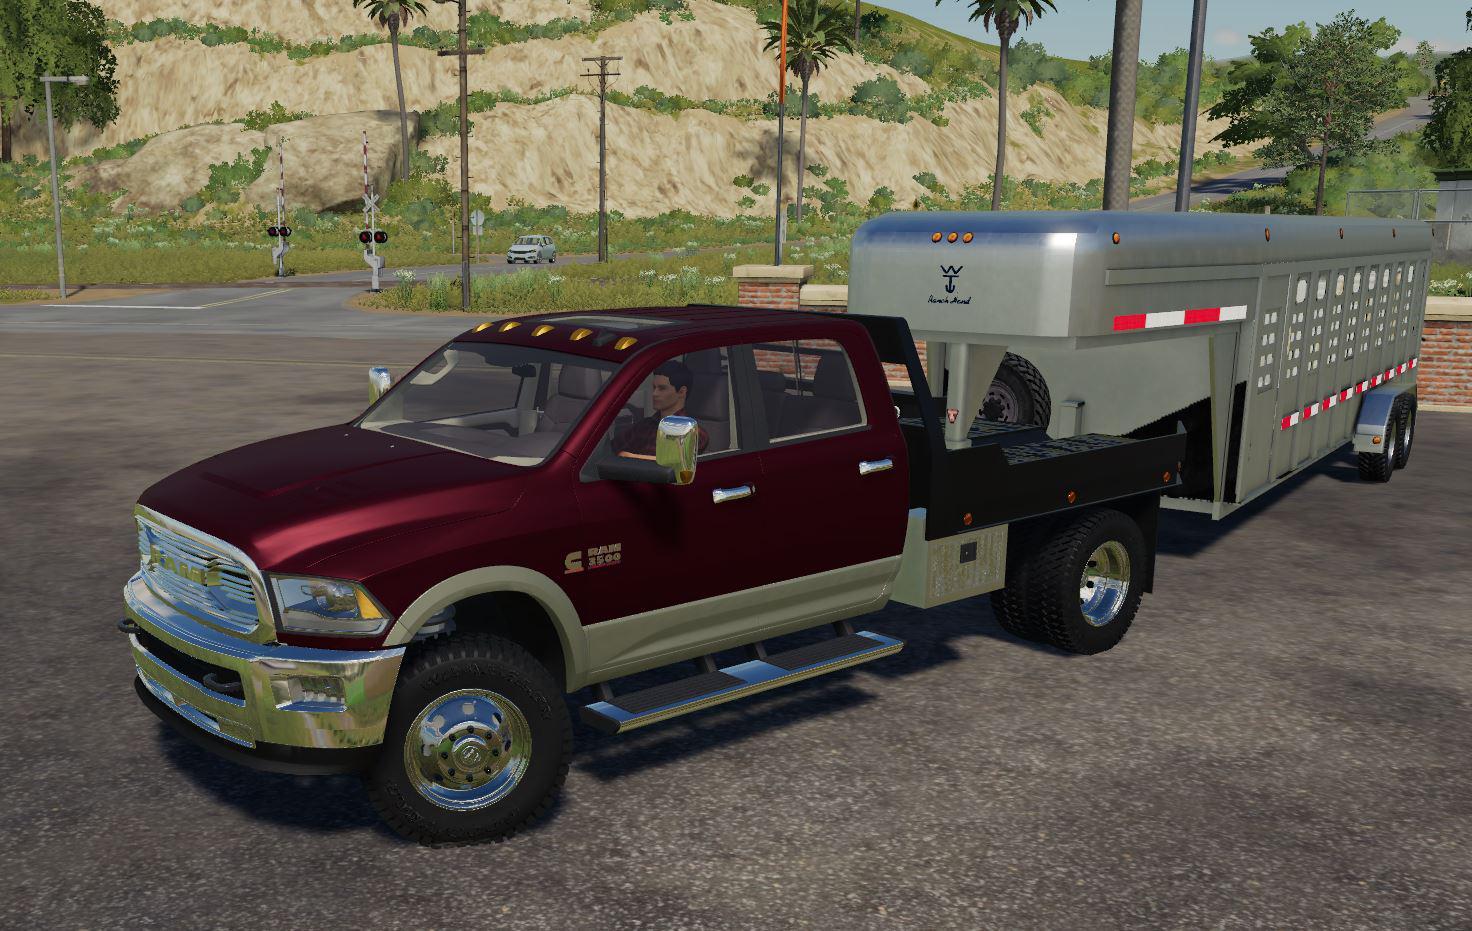 Dodge Ram 3500 Flatbed V1 0 0 0 Fs19 Farming Simulator 19 Mod Fs19 Mod